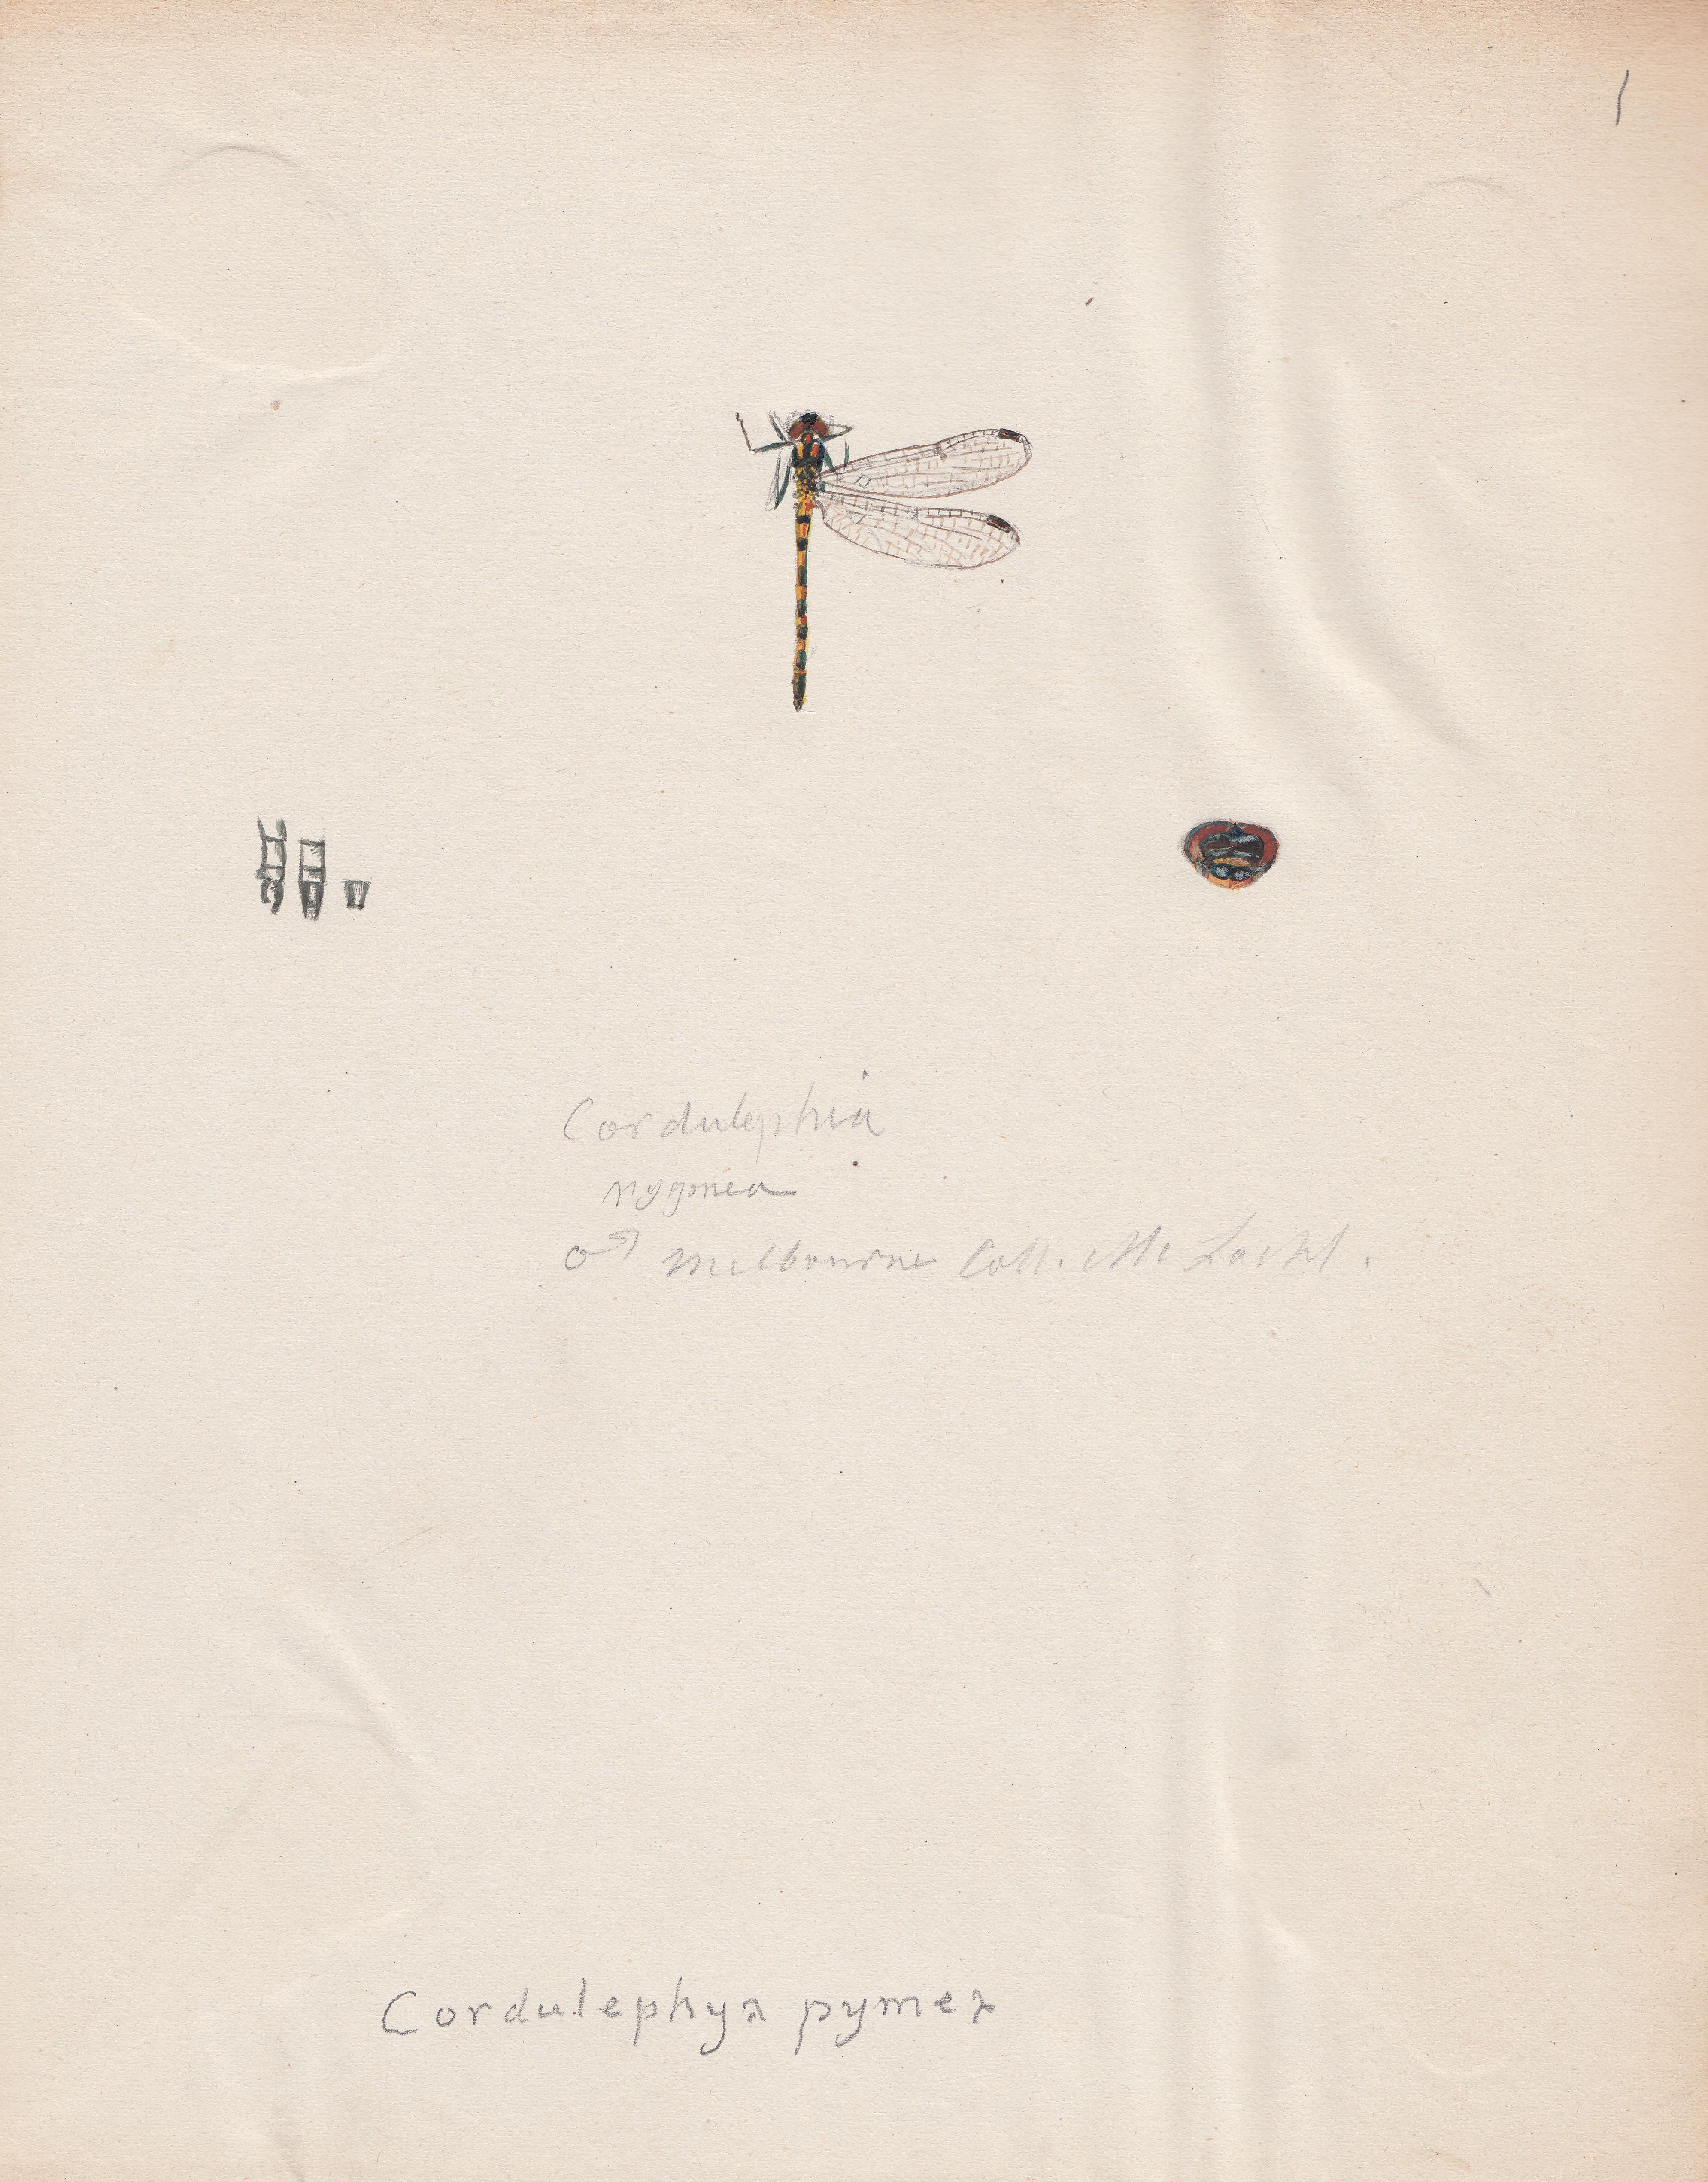 Cordulephya pygmea.jpg